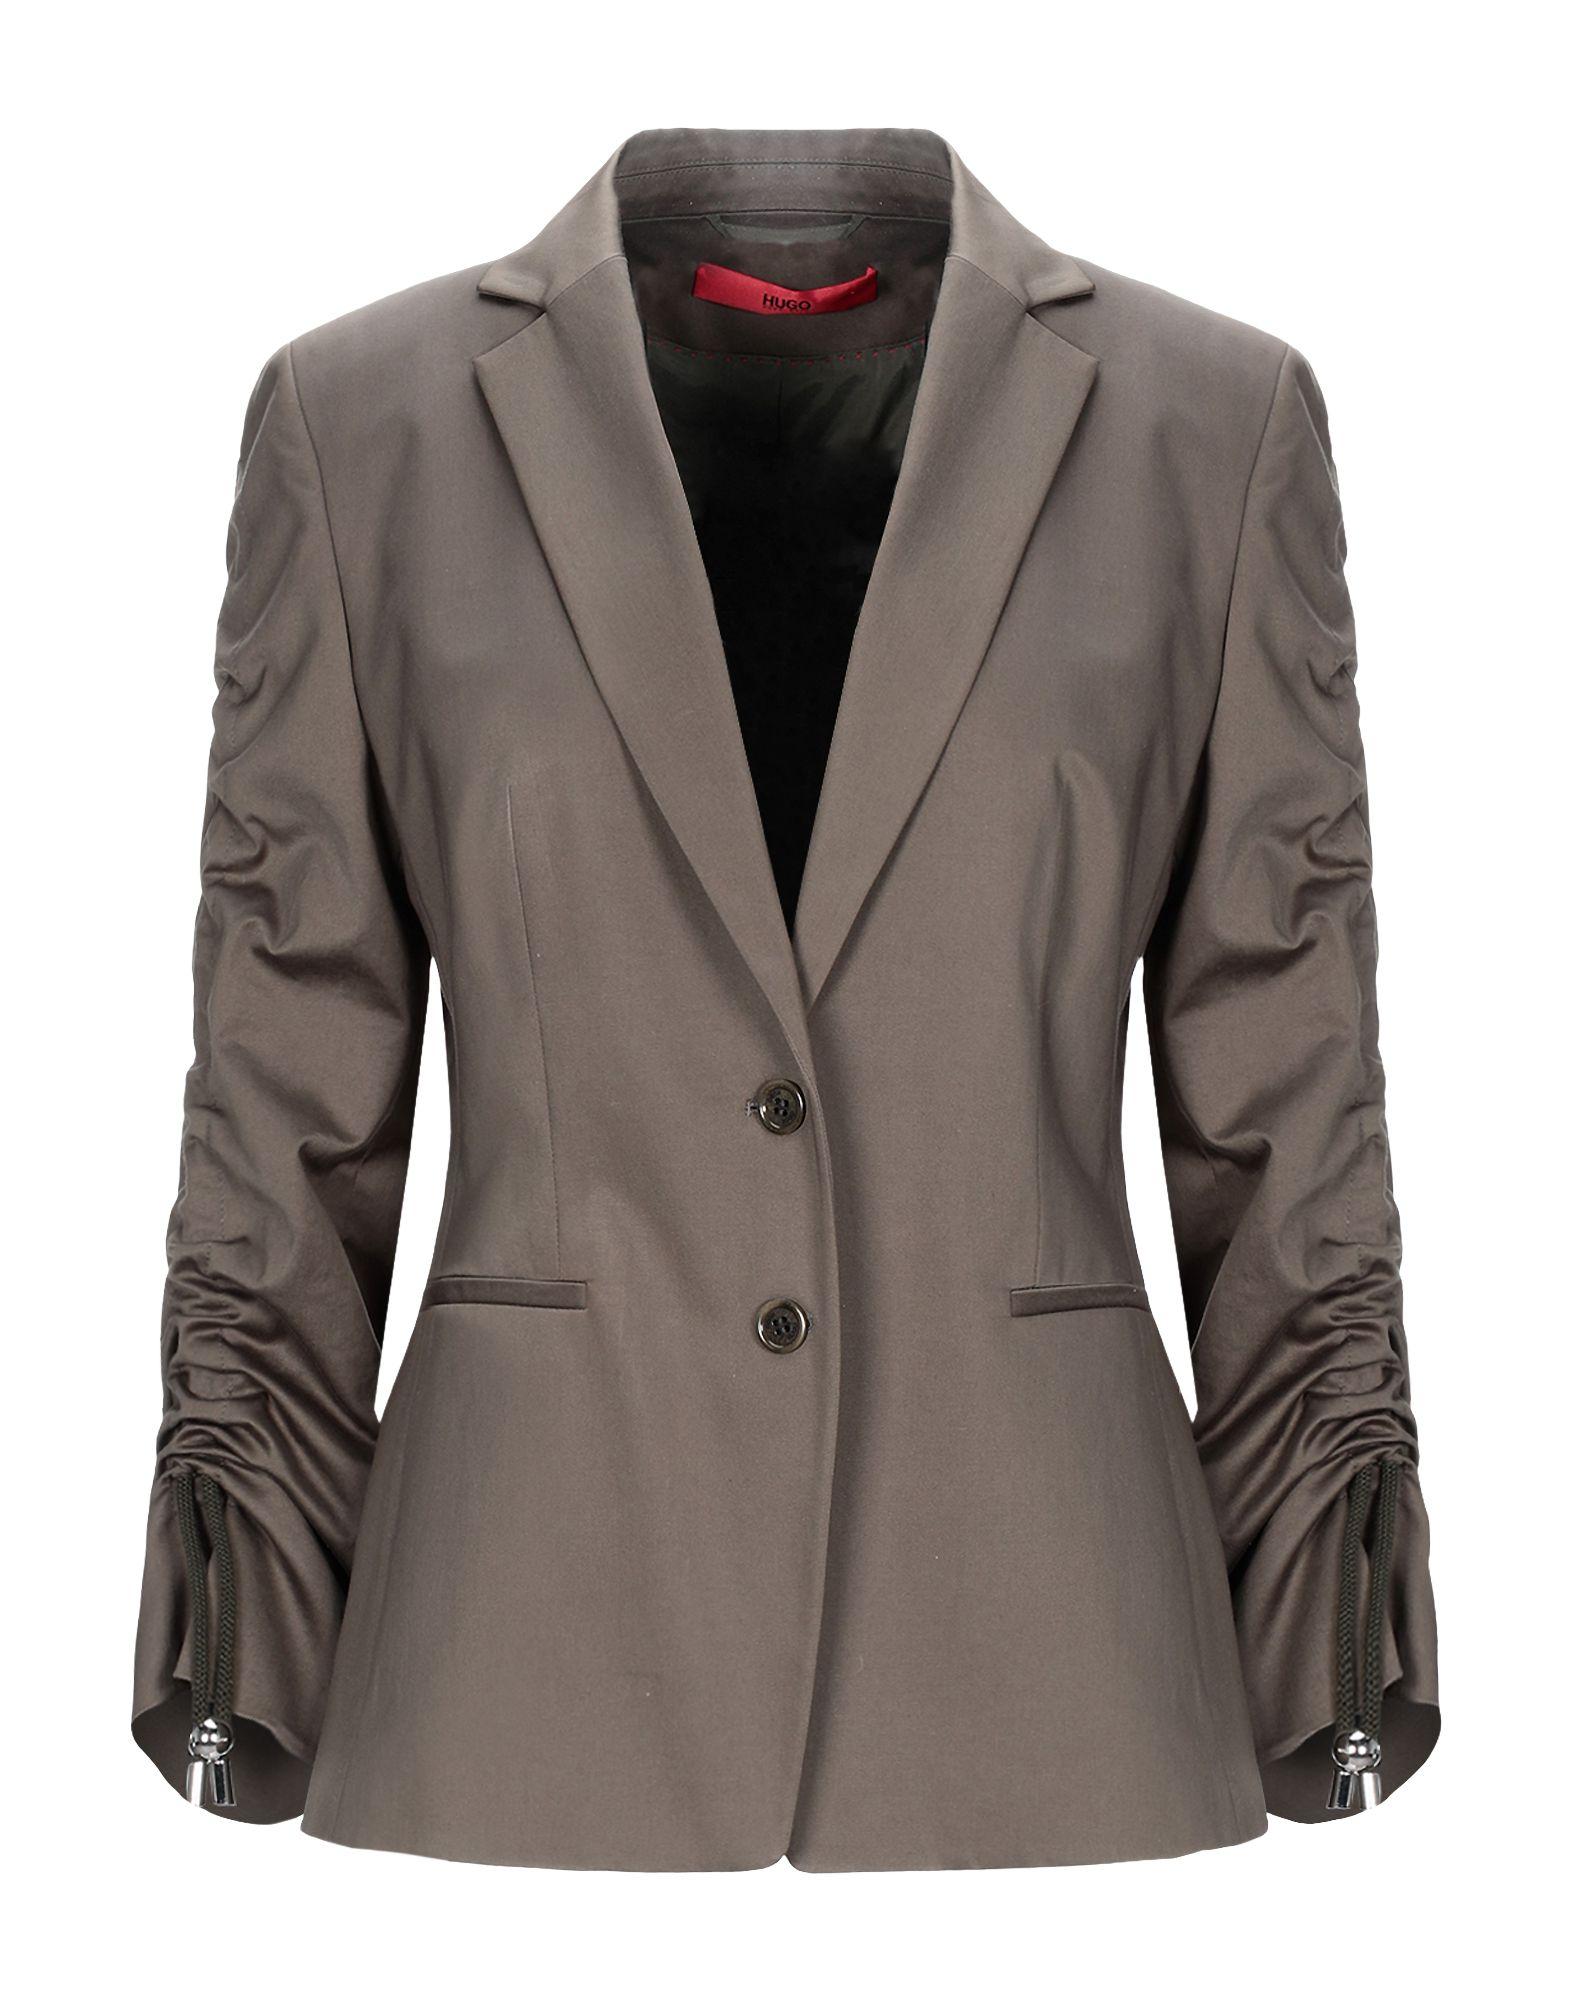 HUGO HUGO BOSS Пиджак пиджак костюм hugo boss 50277703 page 1